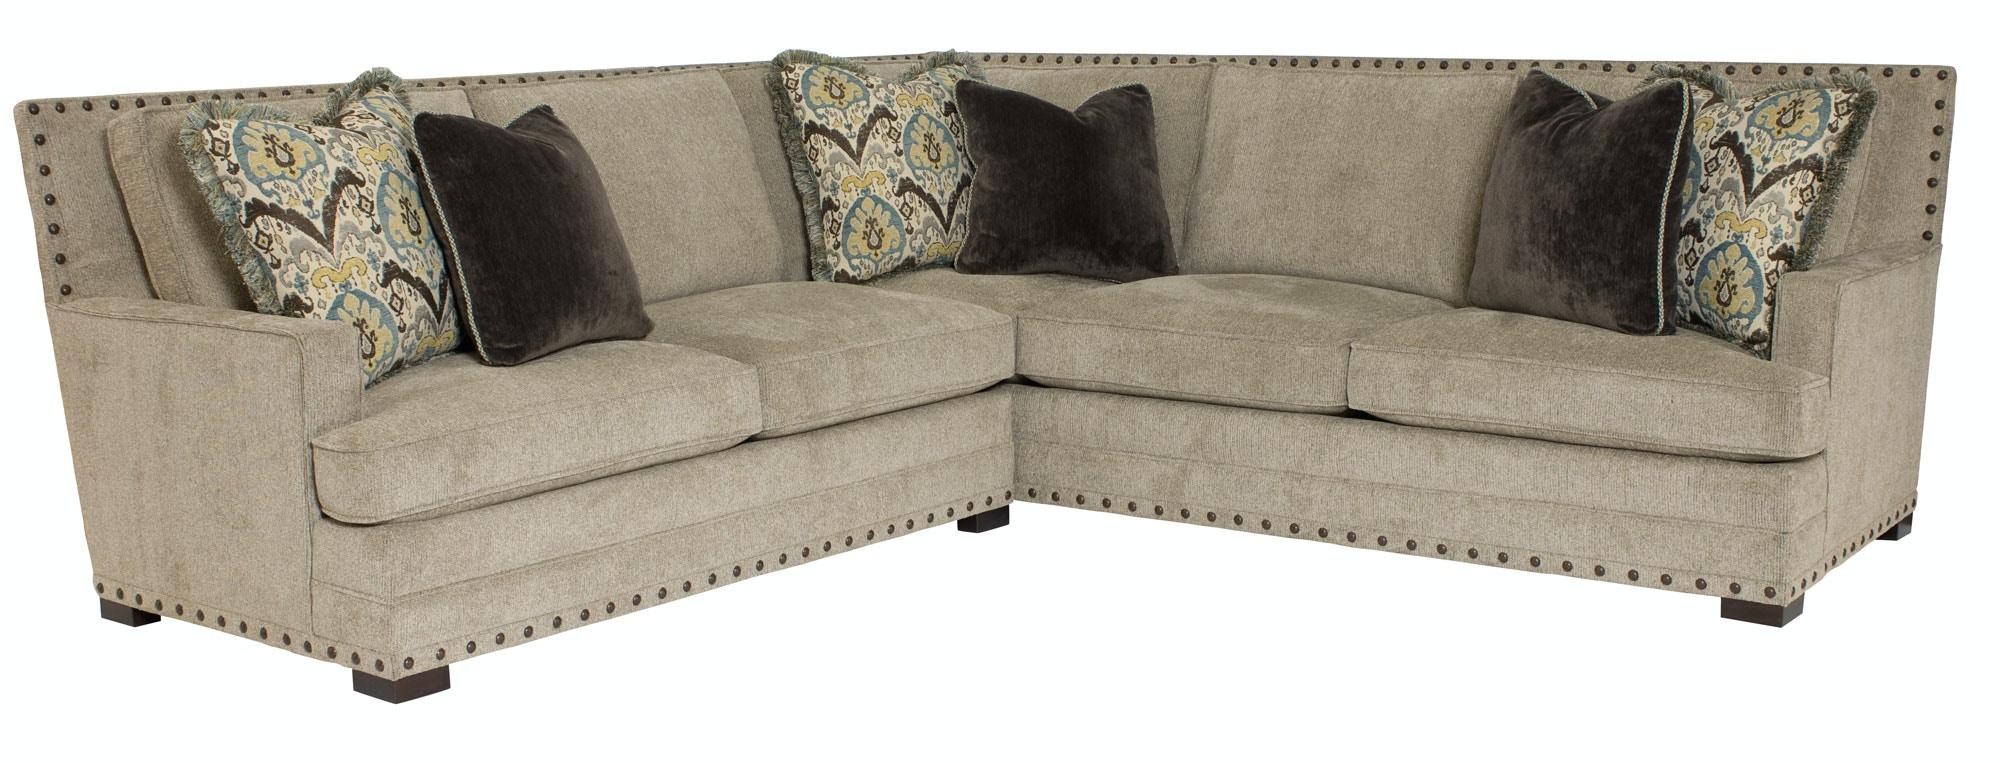 Beautiful Bernhardt Furniture Cantor Sectional B3842, B3893